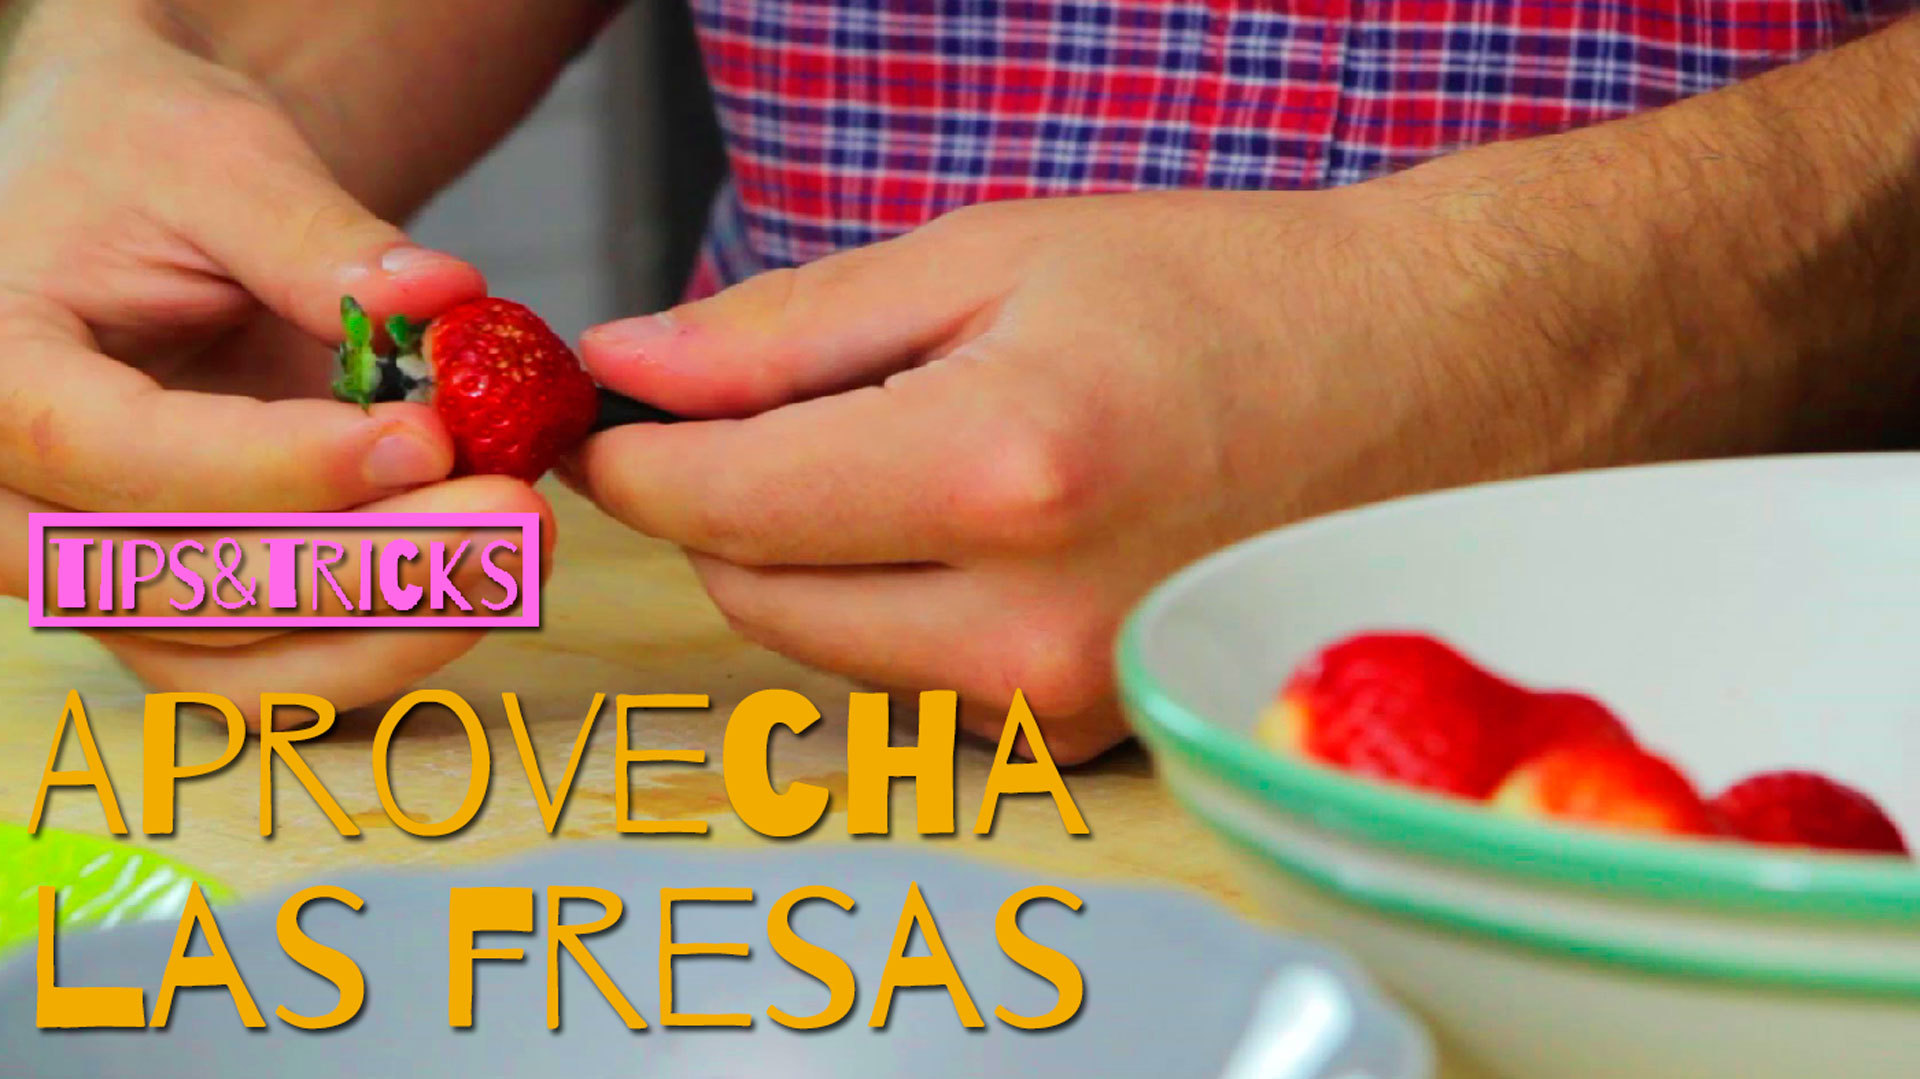 Temporada 1 Aprovecha las Fresas